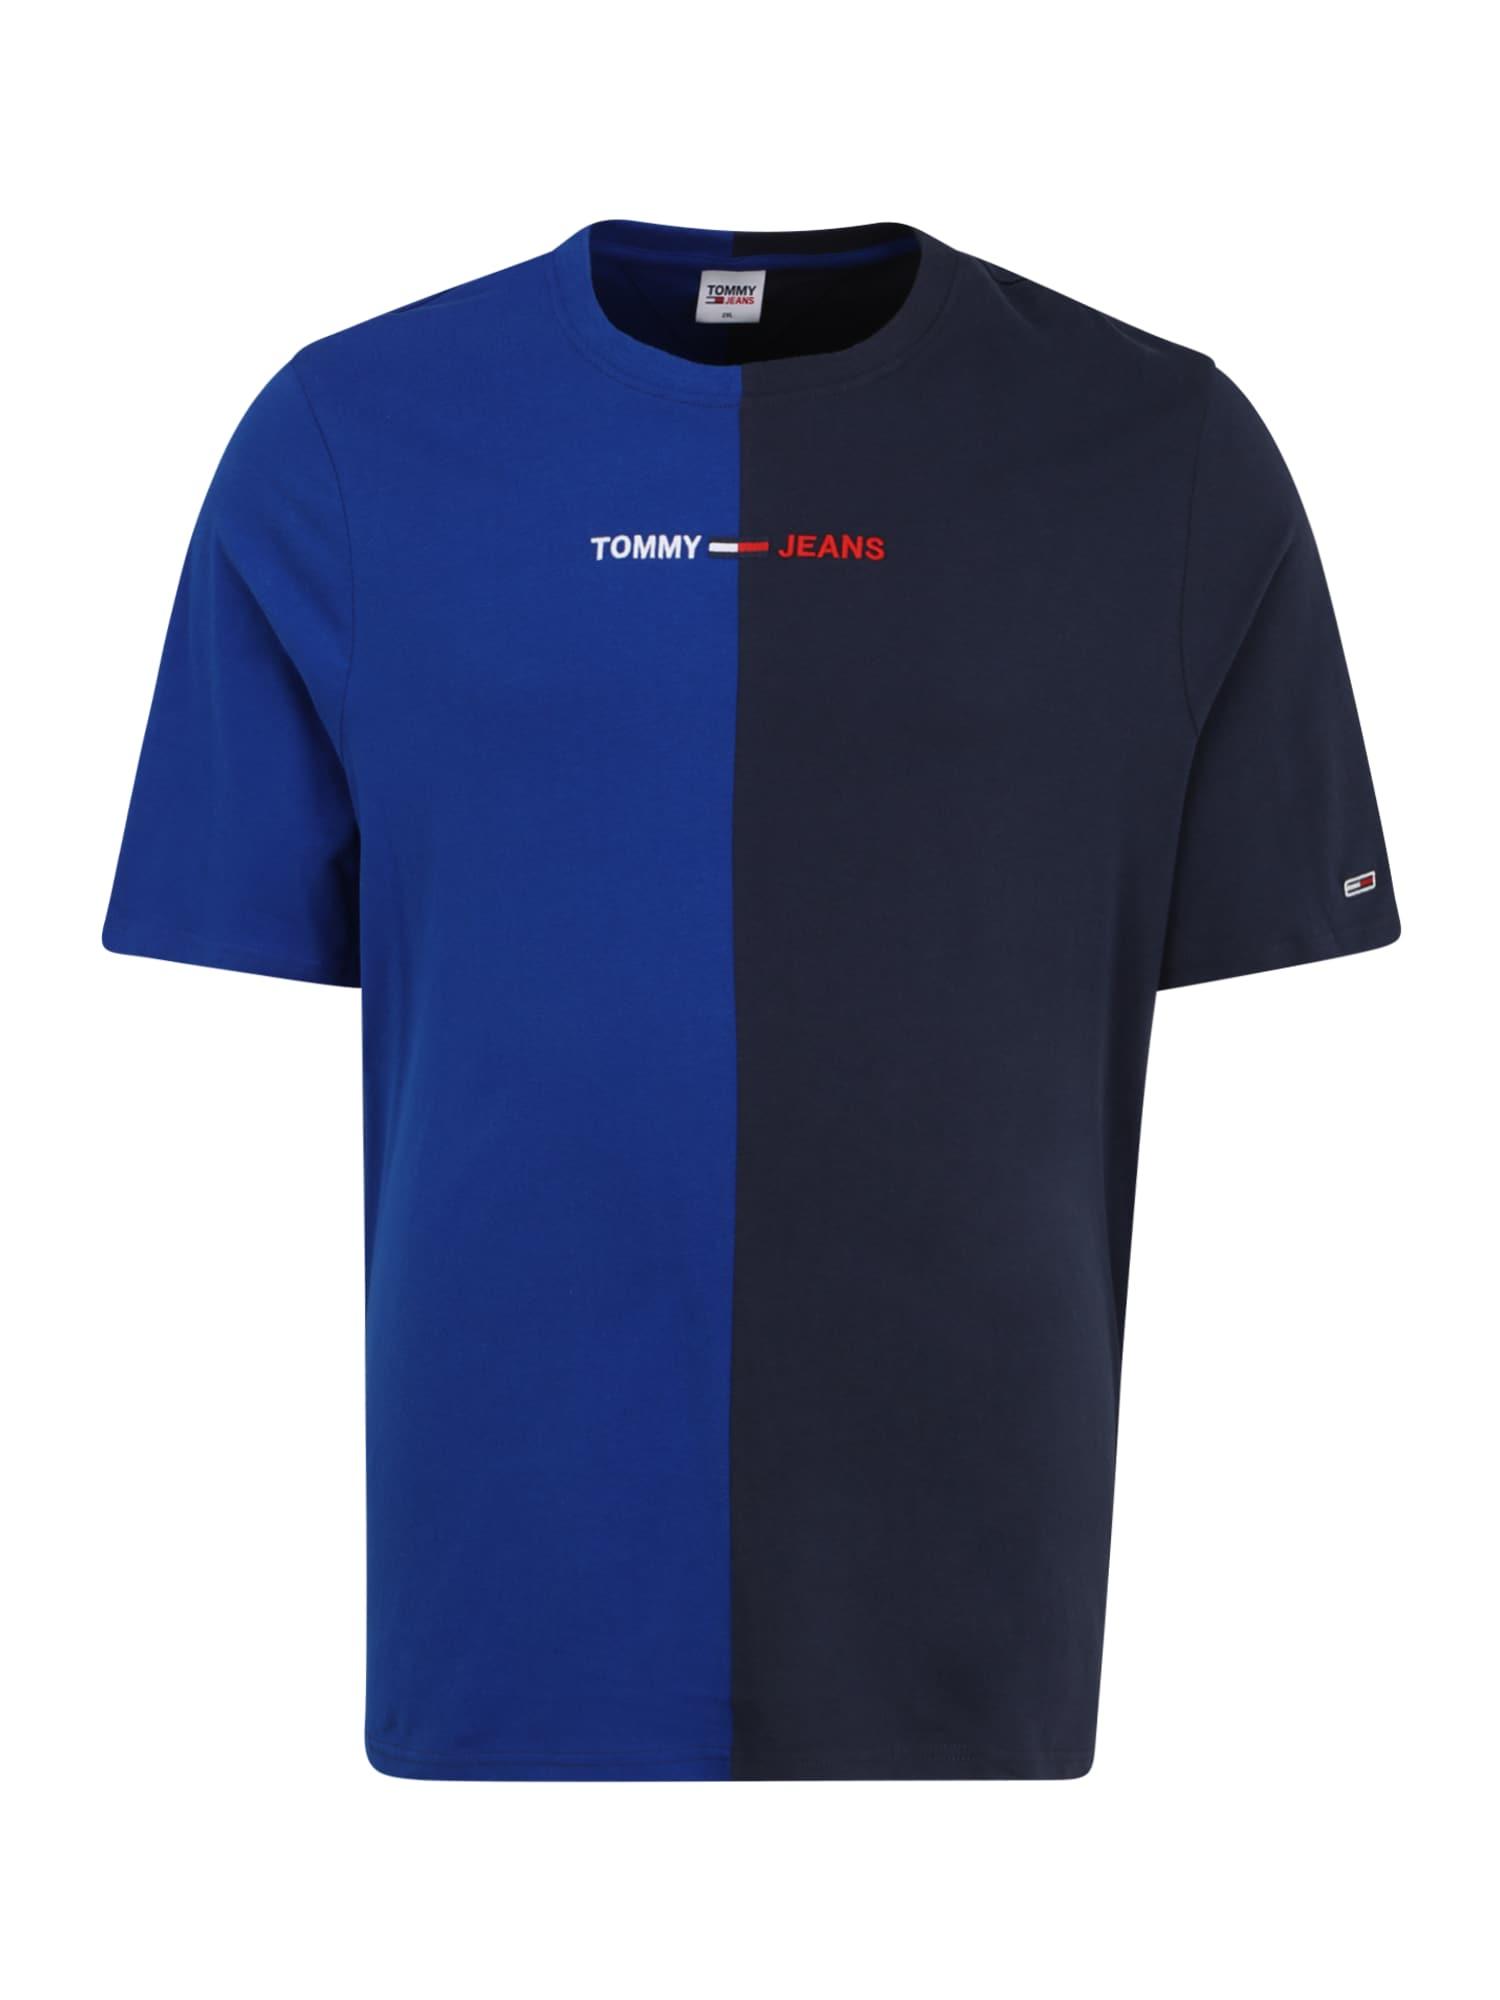 Tommy Jeans Plus Marškinėliai tamsiai mėlyna / mėlyna / balta / raudona